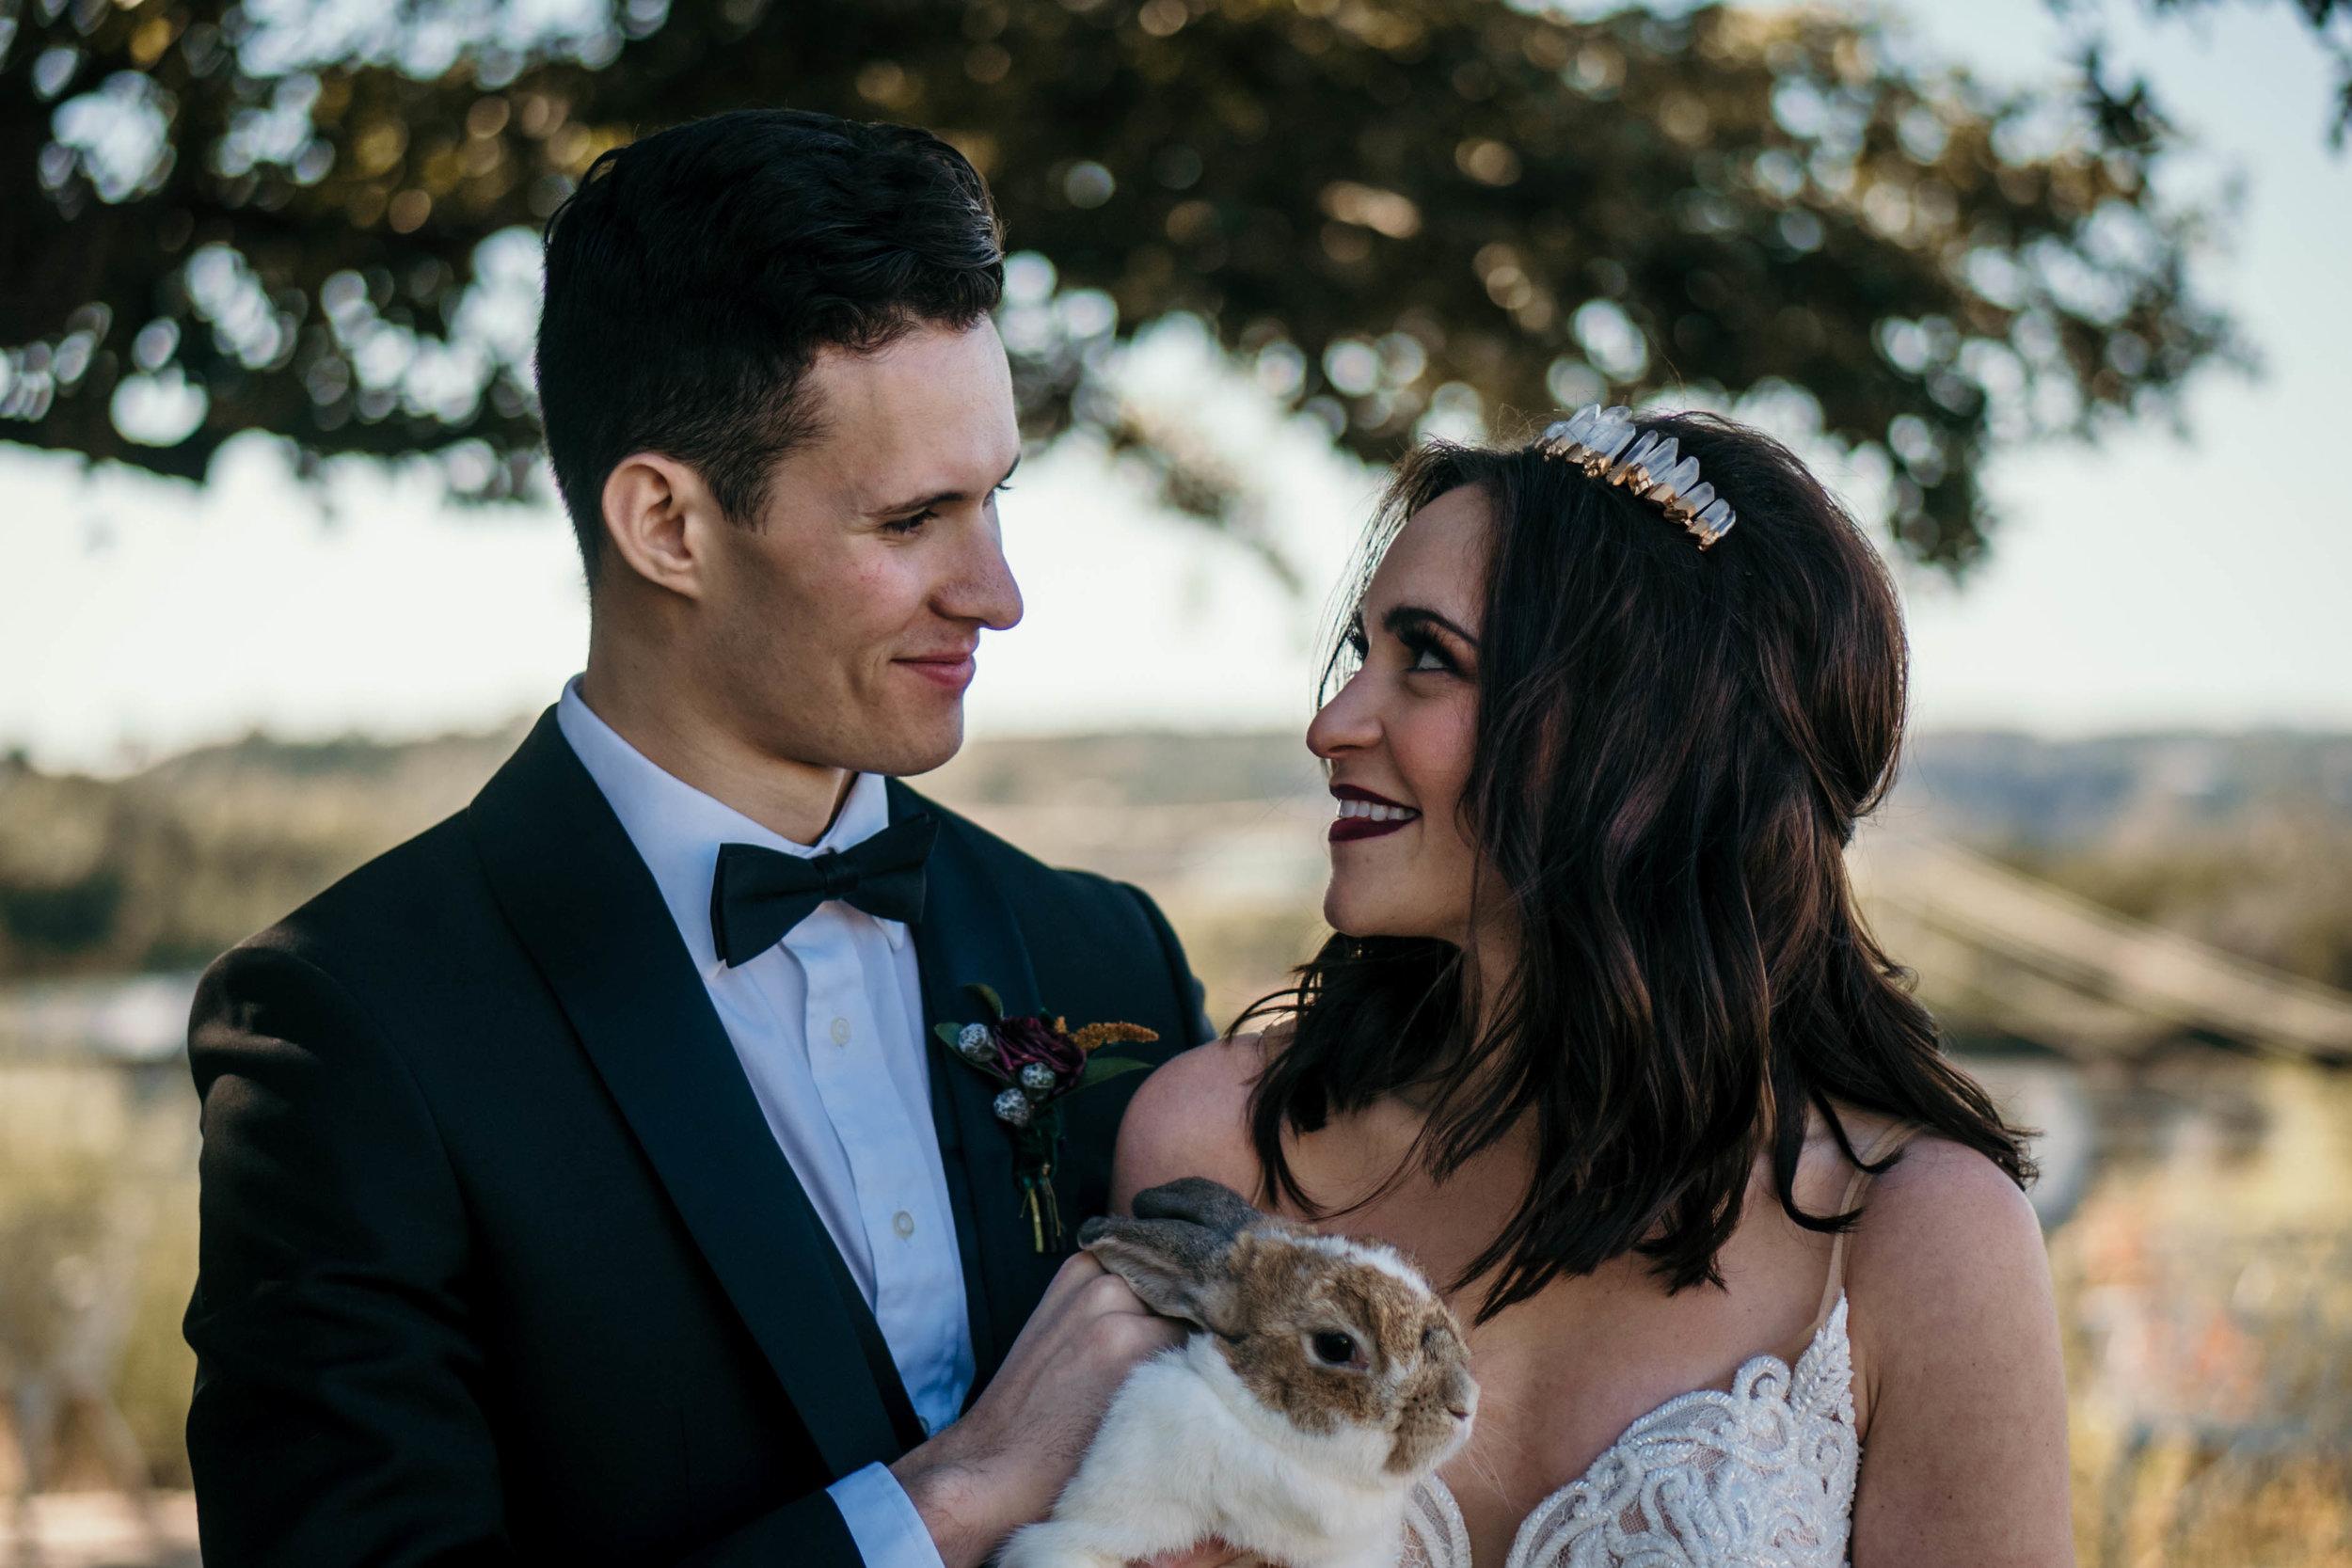 Austin Wedding Videographer - Dolls for Dolls (153 of 323).jpg